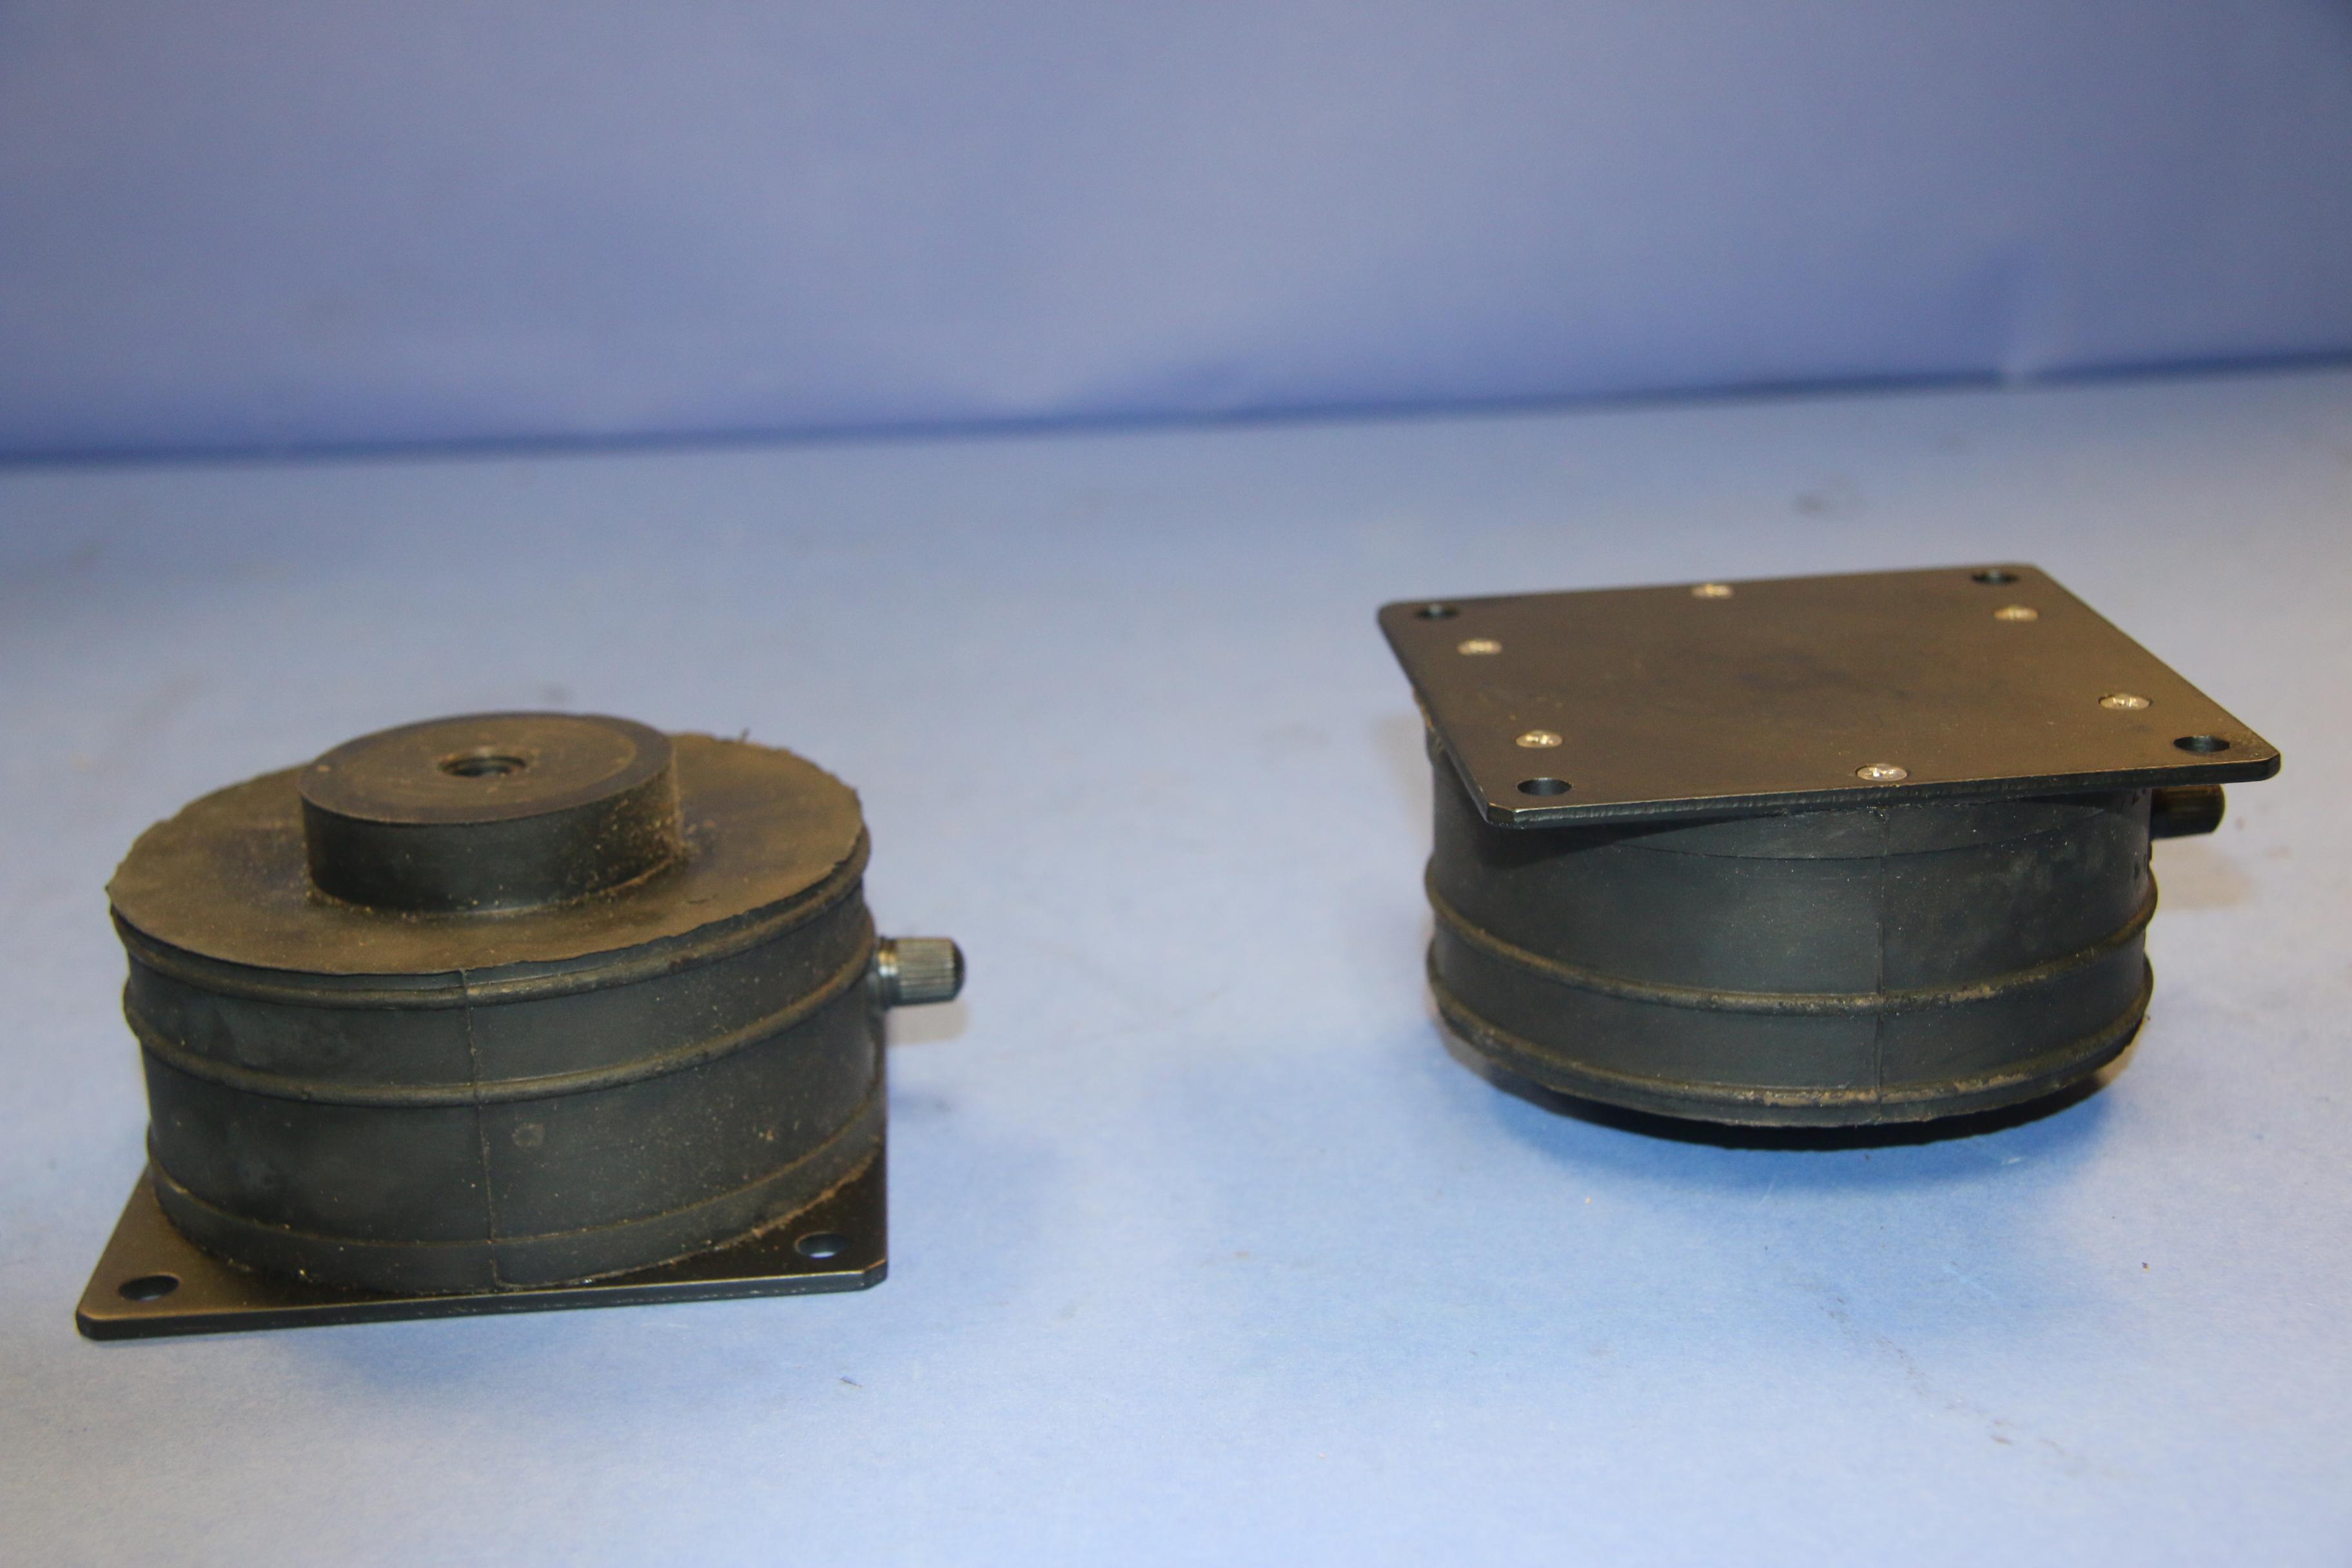 (6) Used Stabl-Levl SLM-1 Vibration Isolation Pads